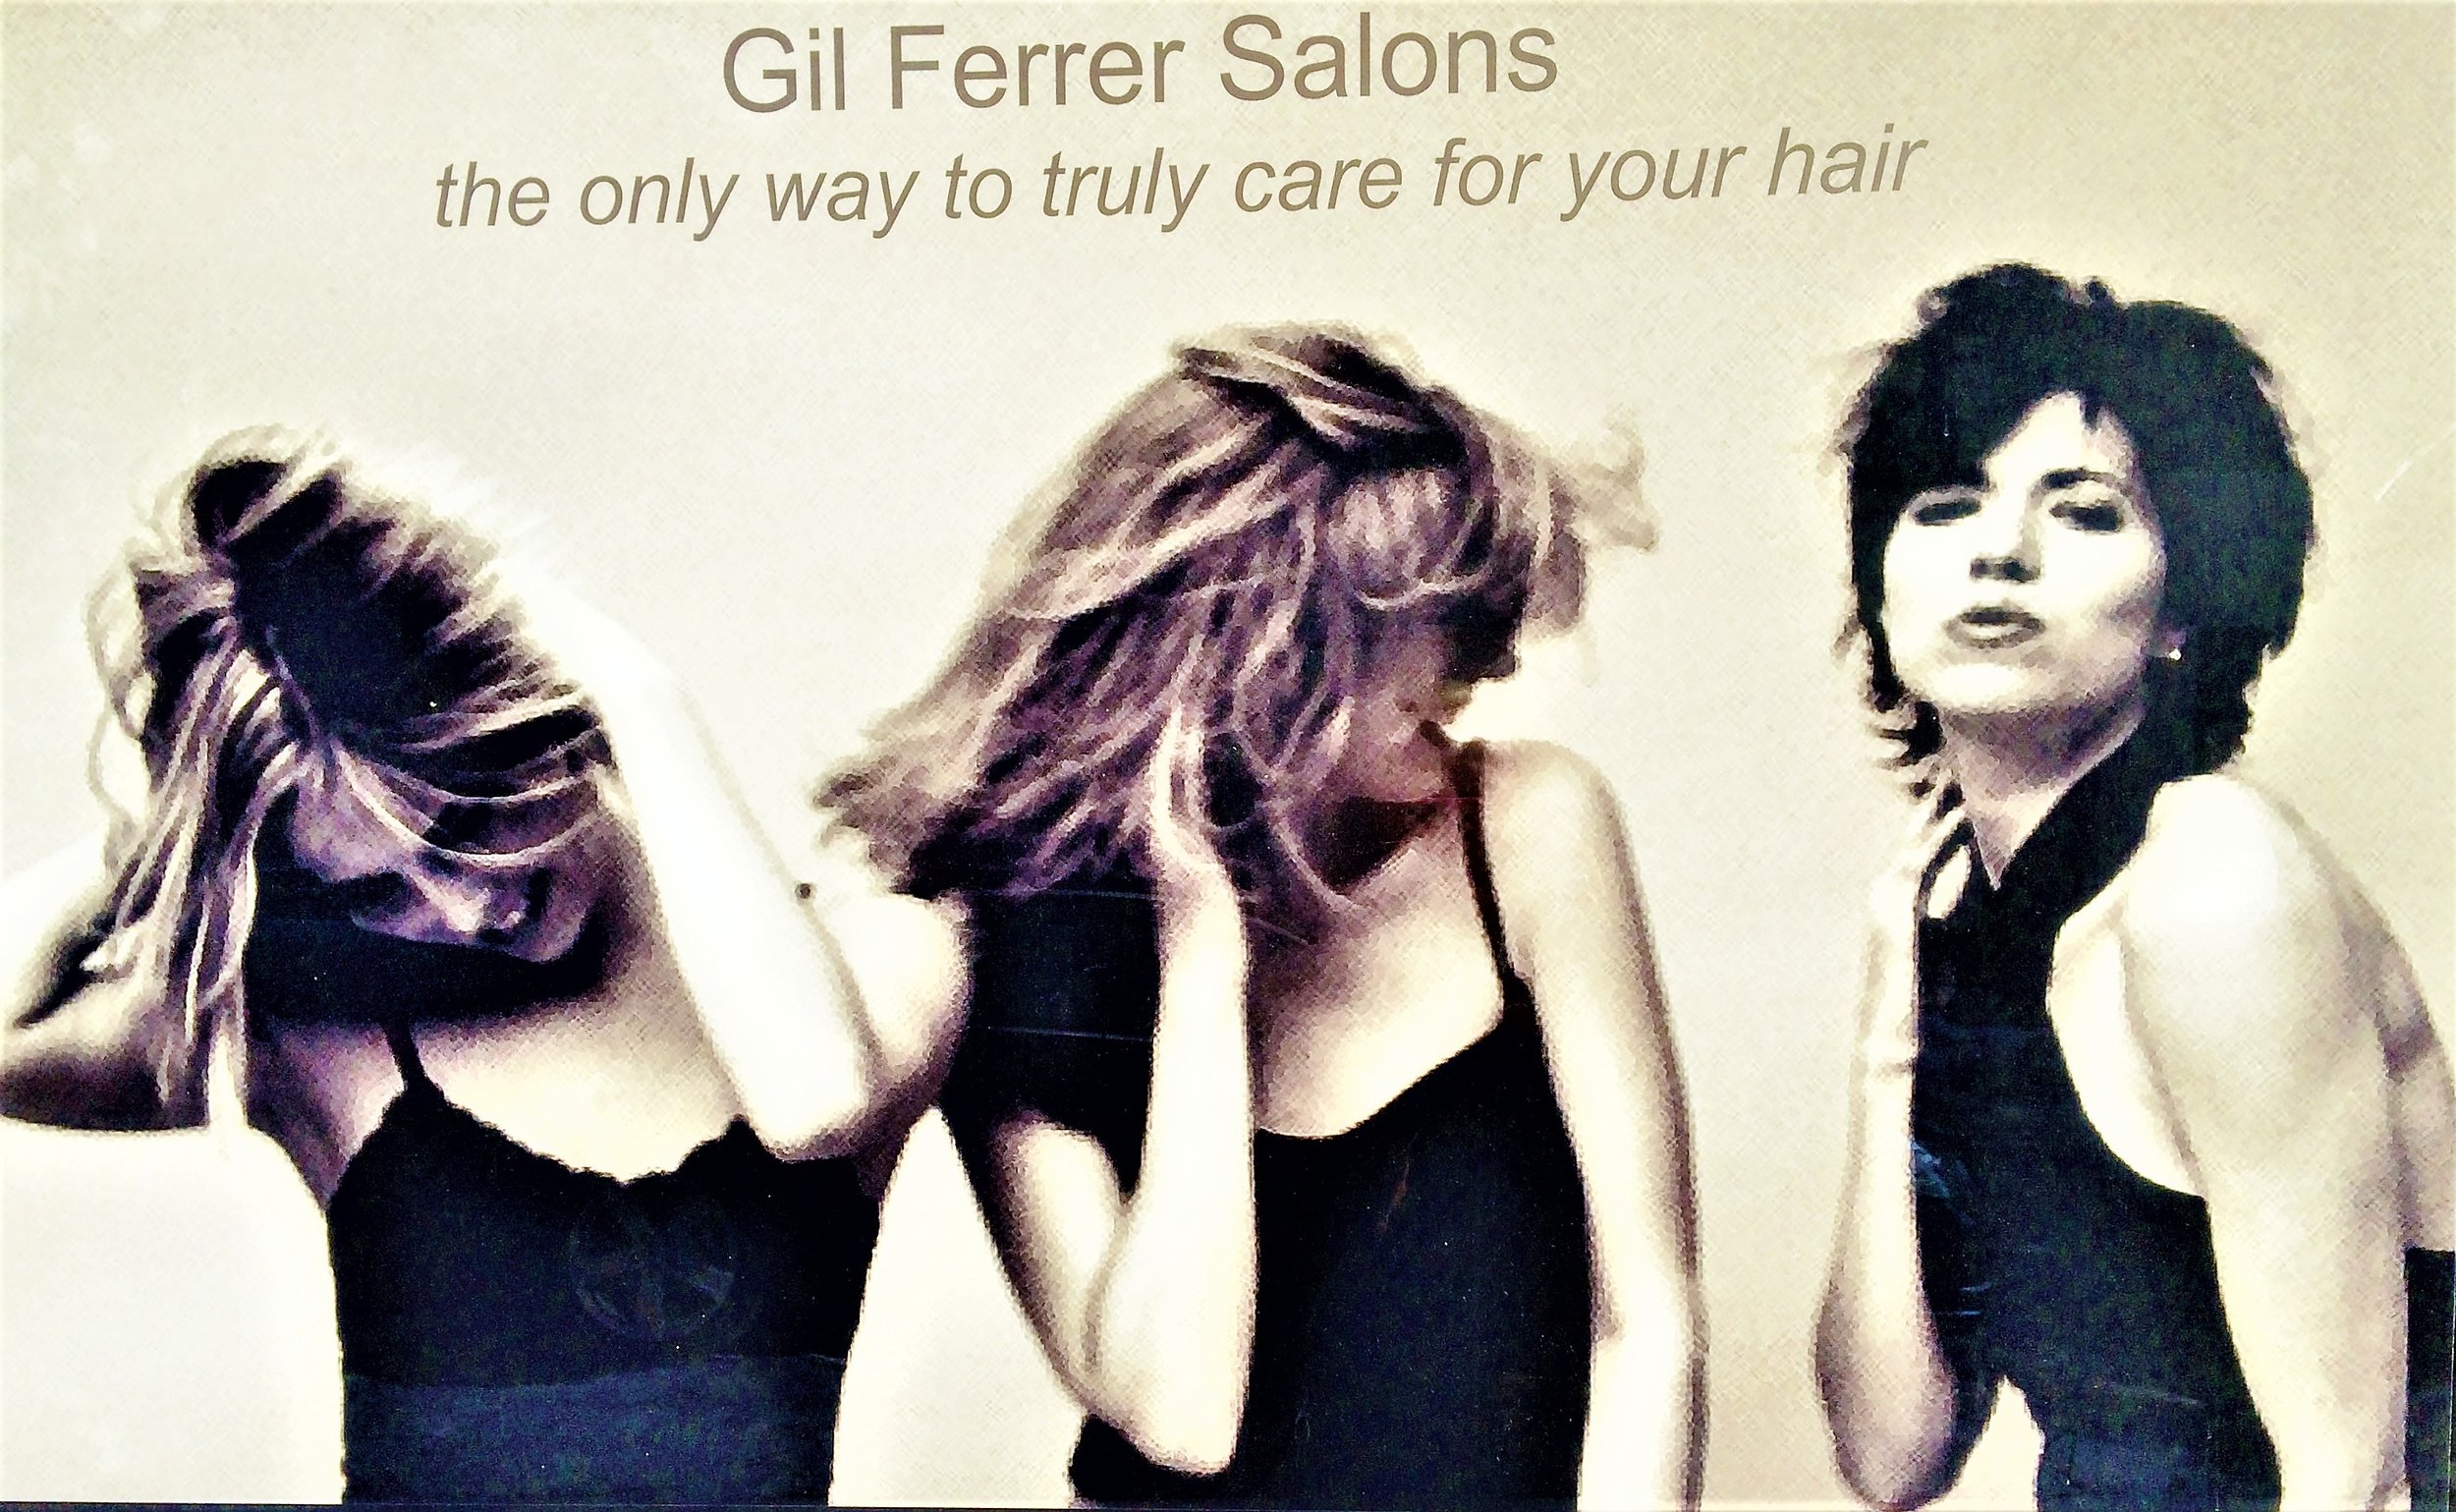 Gil Ferrer and Madison Avenue 009.JPG